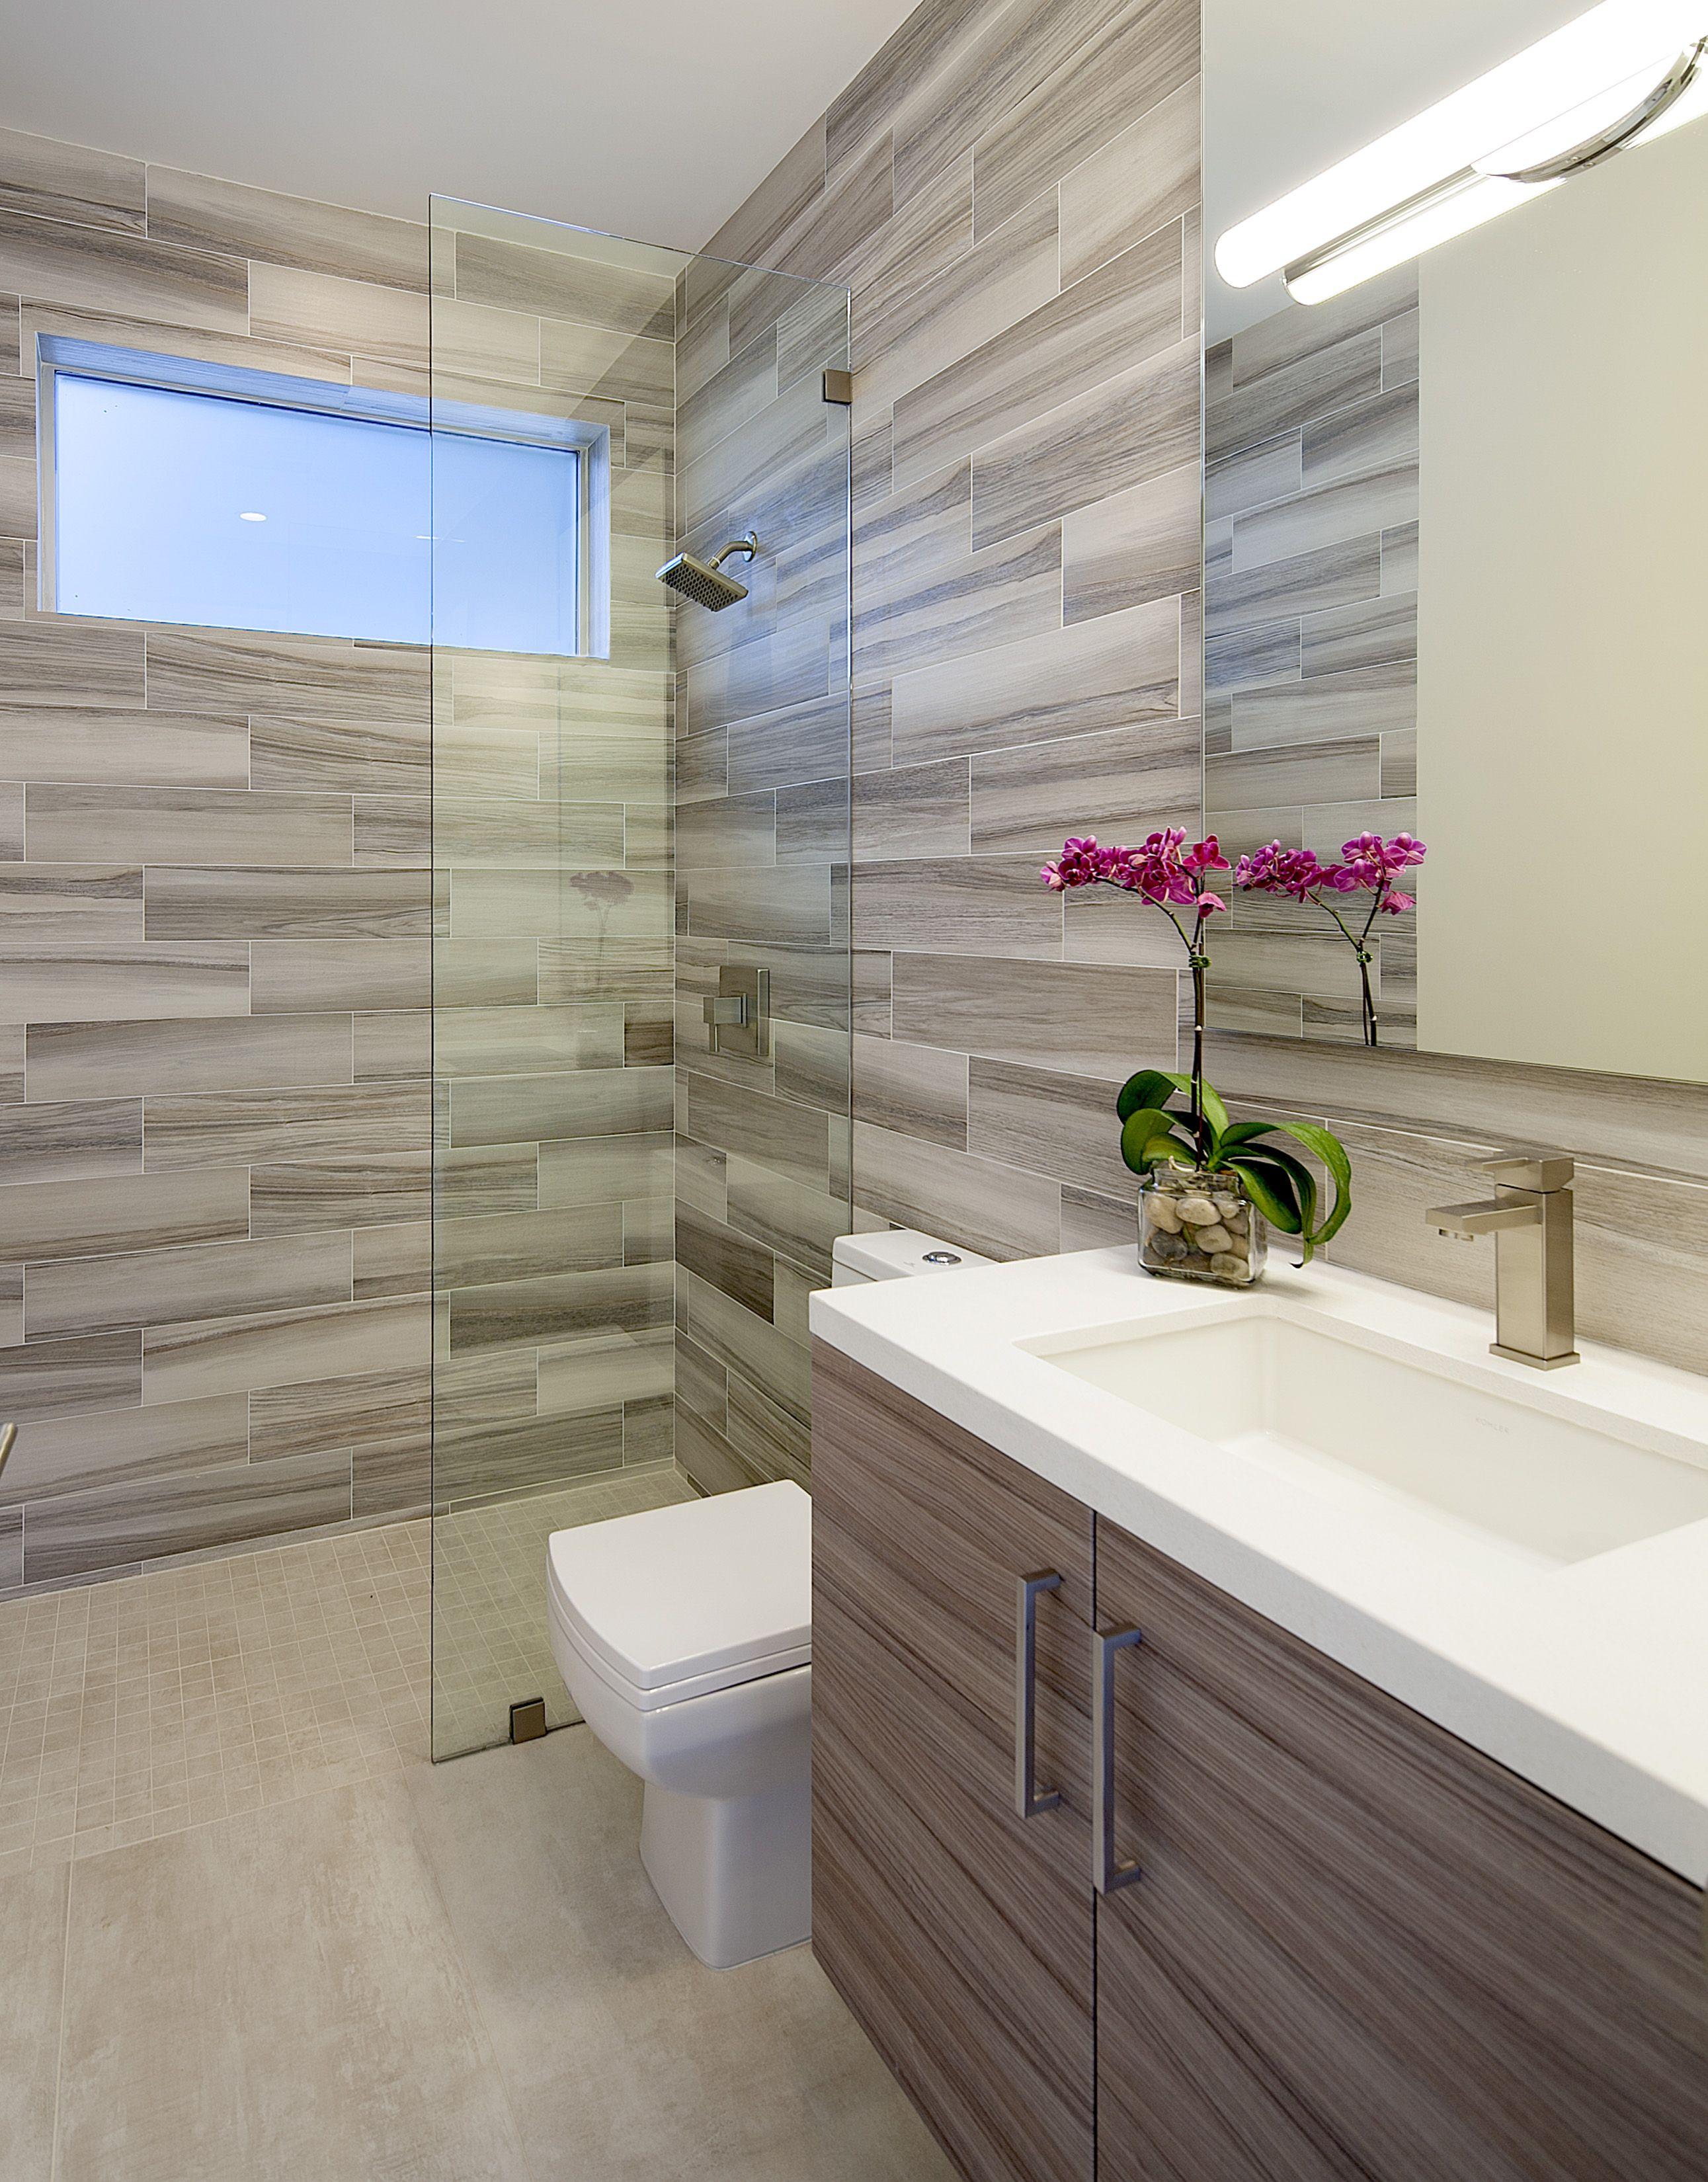 Modern Bathroom At Knobhill In Sherman Oaks By Boswell Construction - Bathroom remodeling sherman oaks